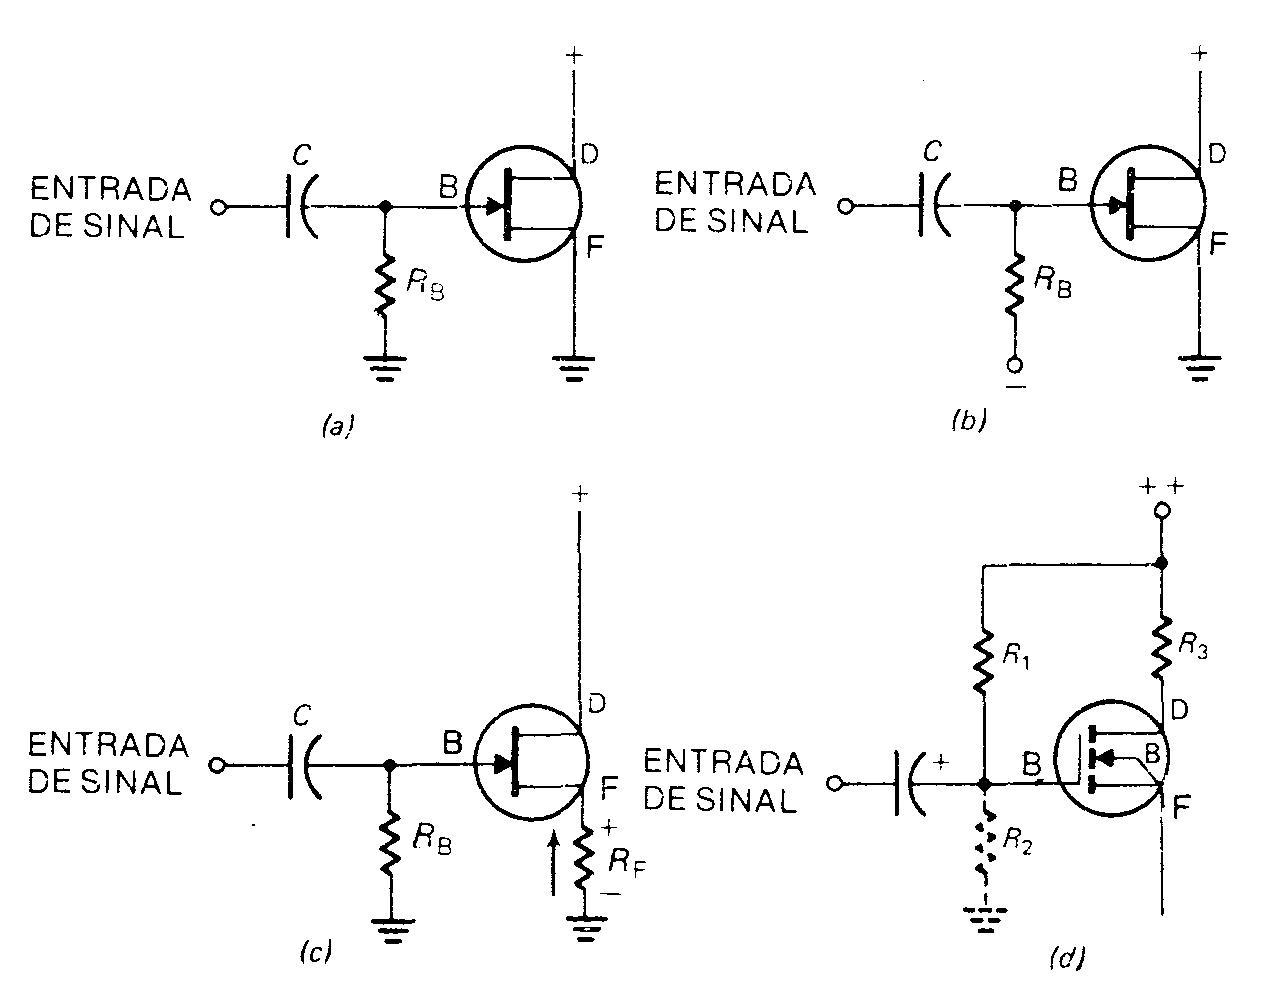 Conhecendo componentes eletronicos Polarizacao-circuitos